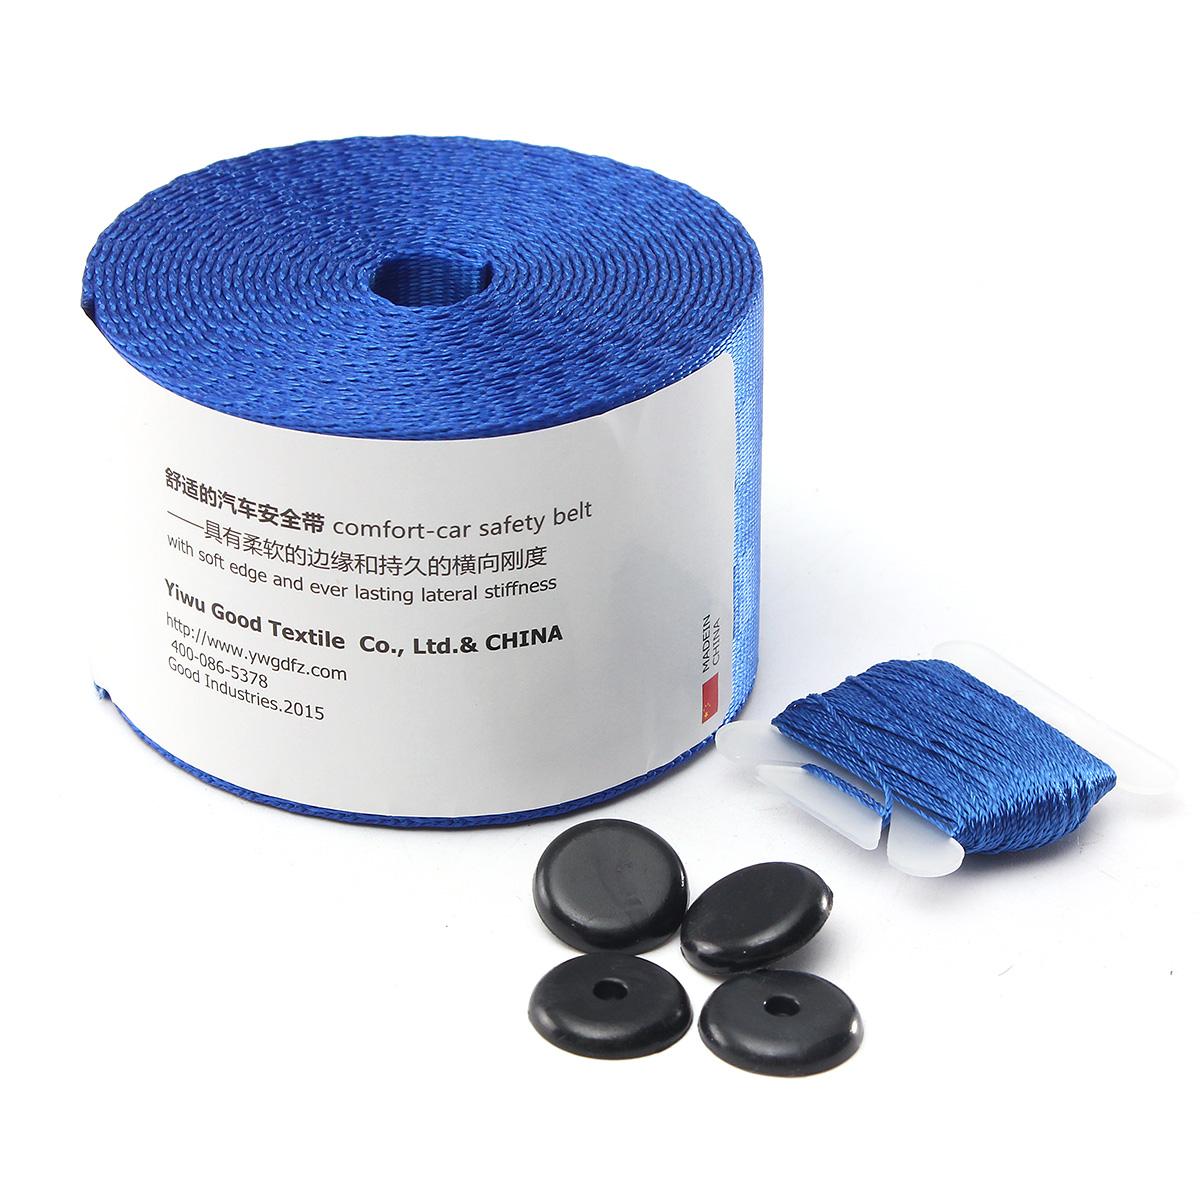 universel 3 point r tractable ceinture de s curit auto si ge voiture belt ebay. Black Bedroom Furniture Sets. Home Design Ideas